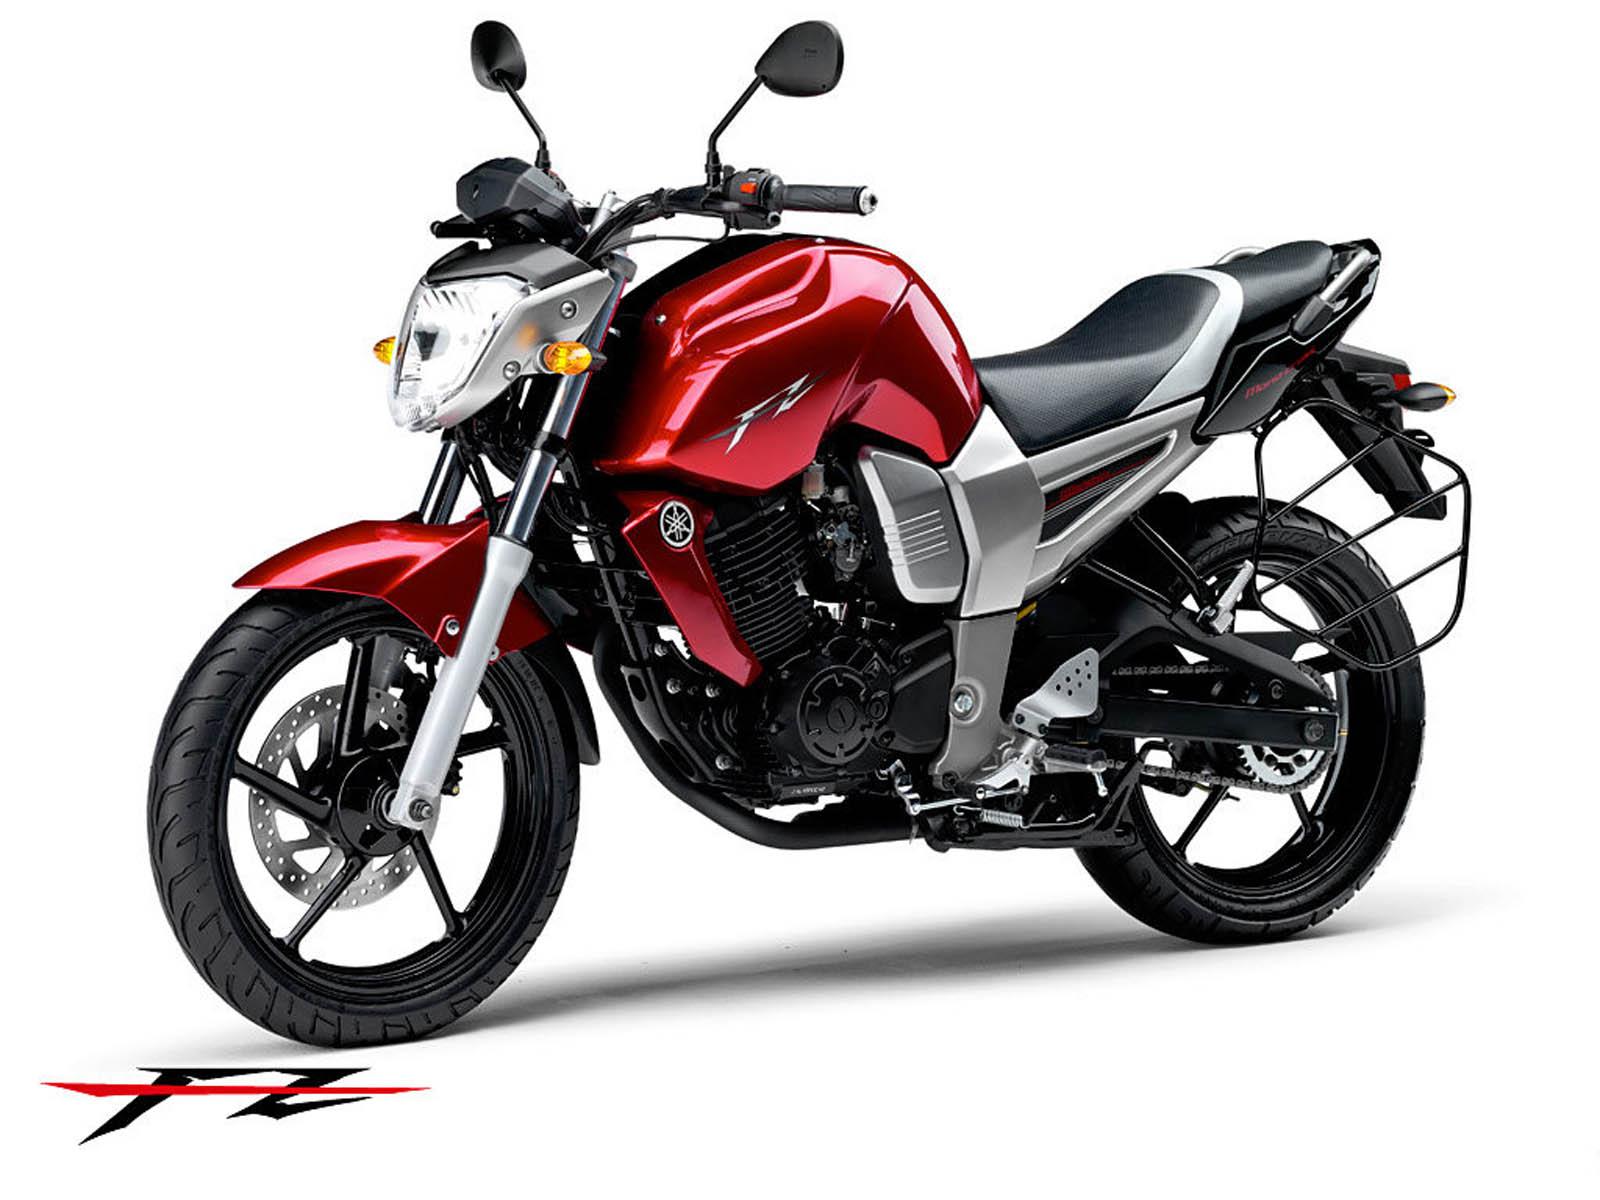 Yamaha Bikes Images Free Download